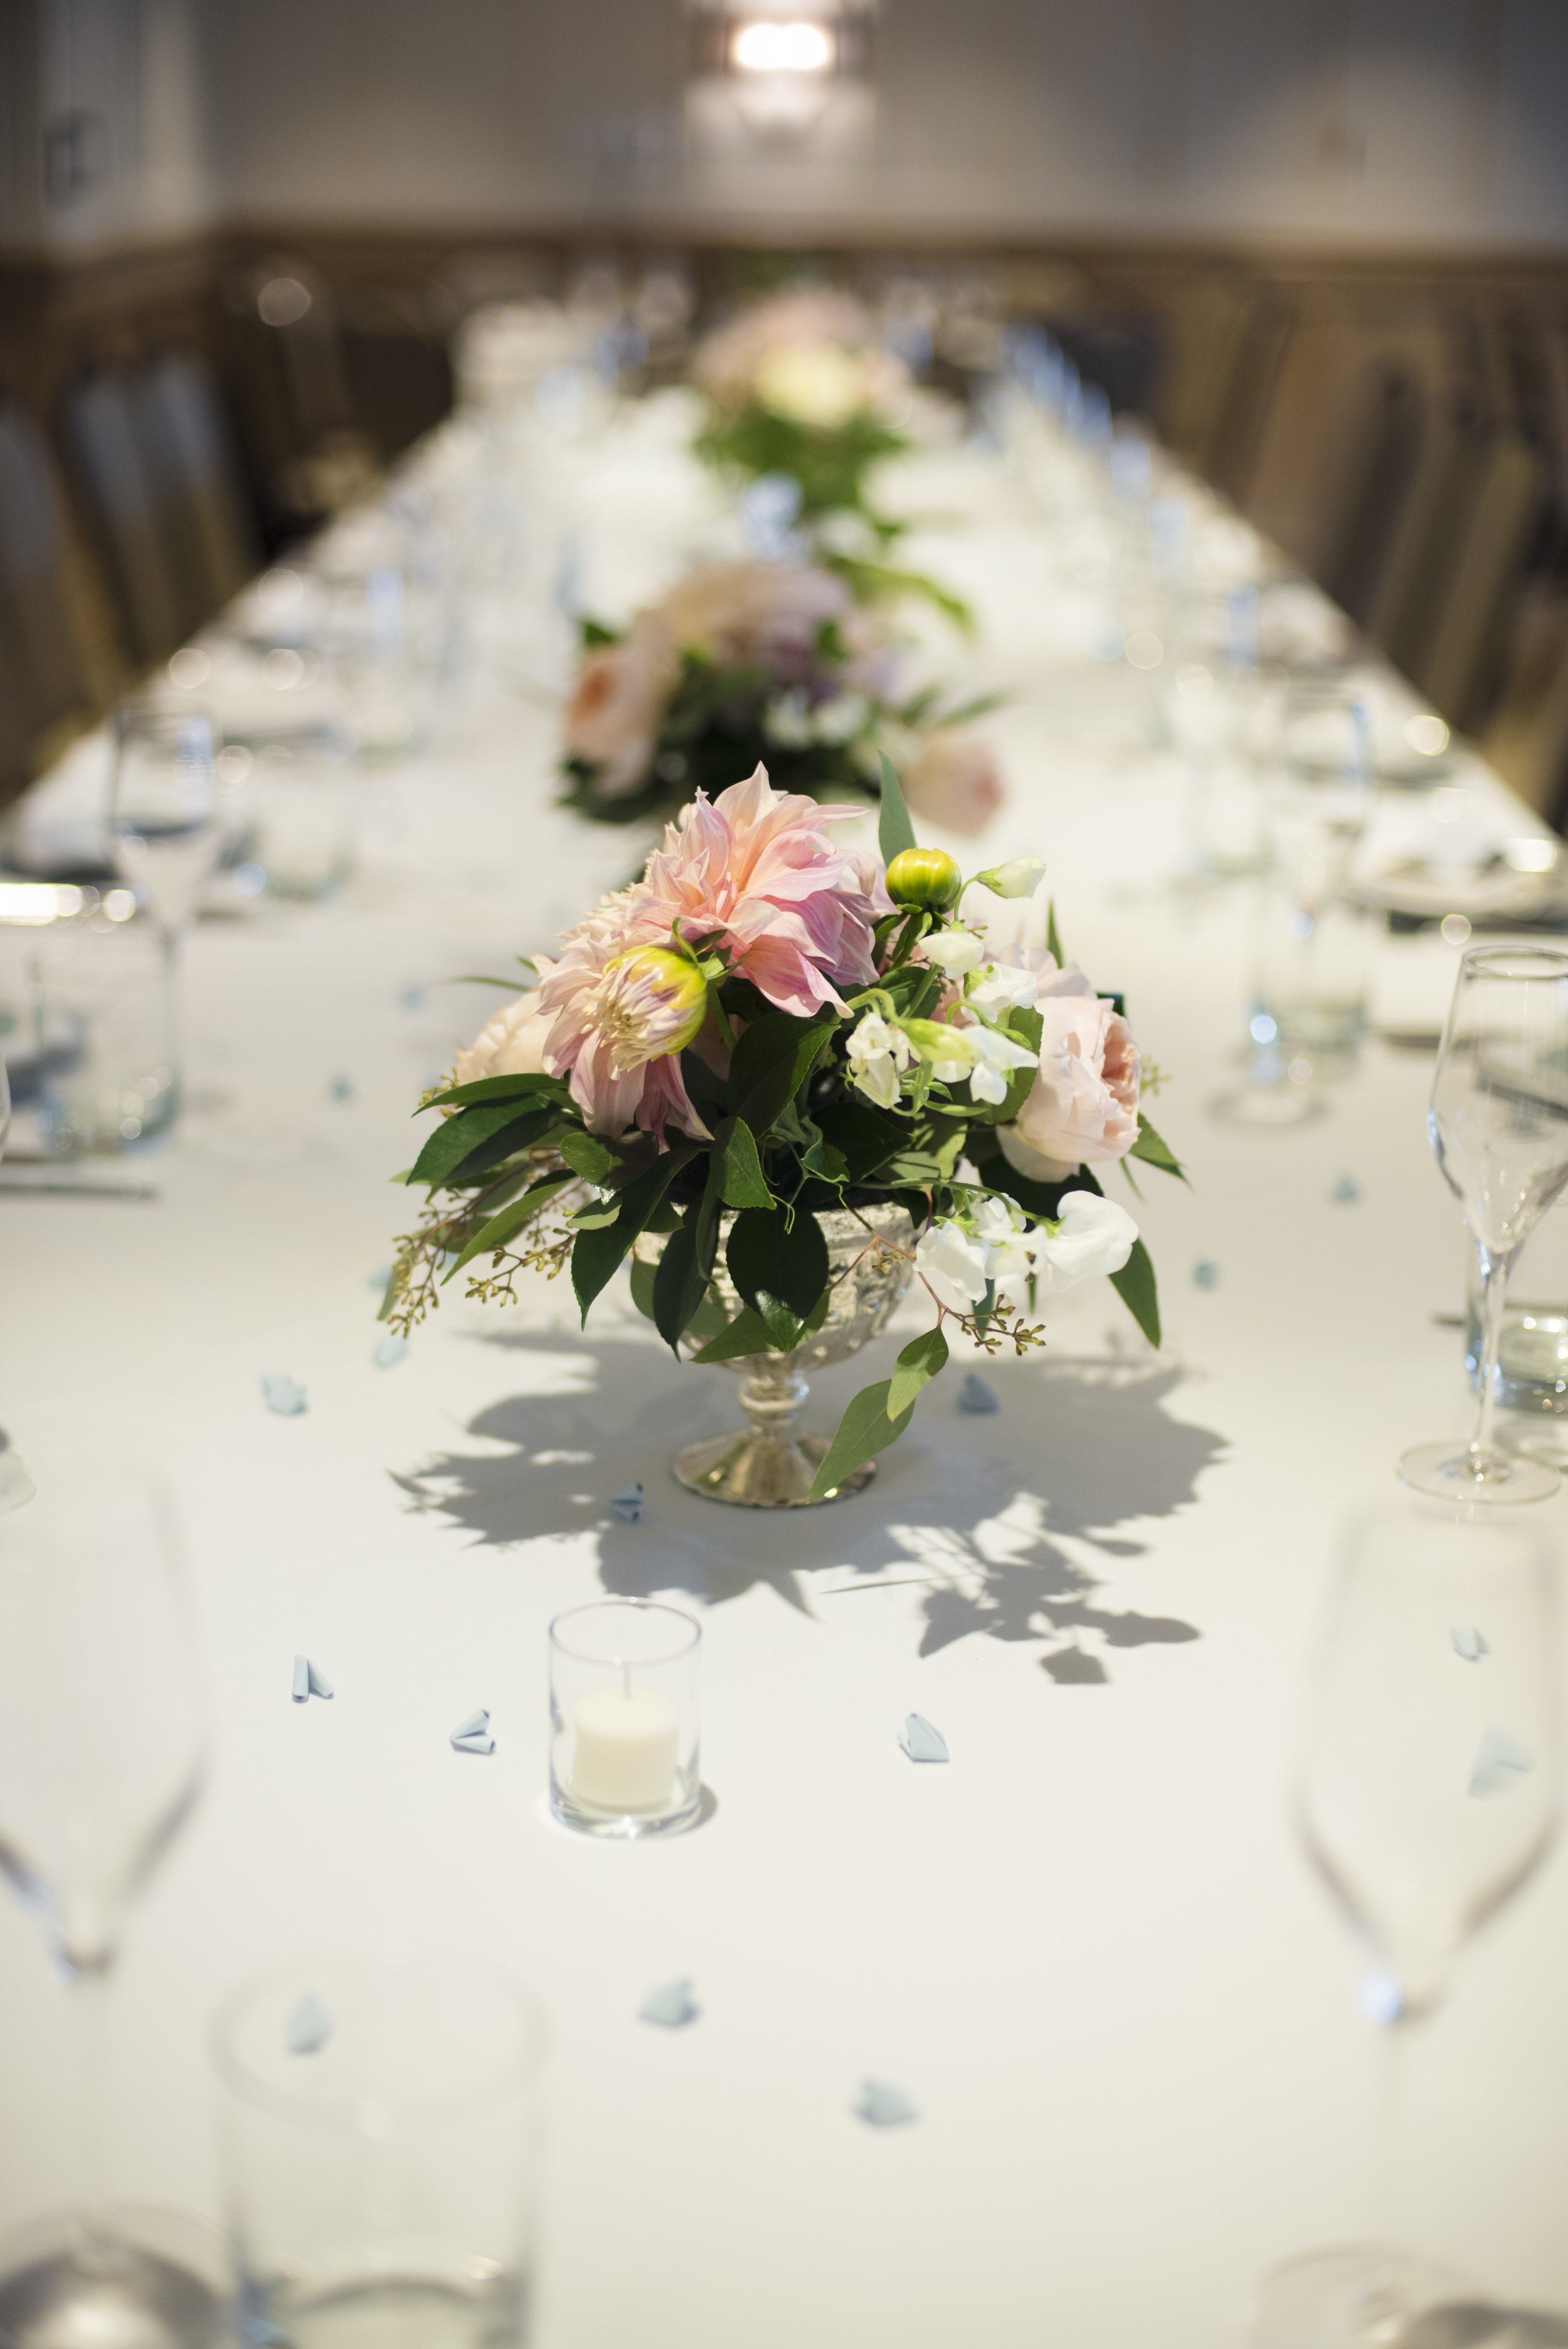 www.santabarbarawedding.com   ByCherry Photography   Felici Events   Convivo Restaurant   Reception Table